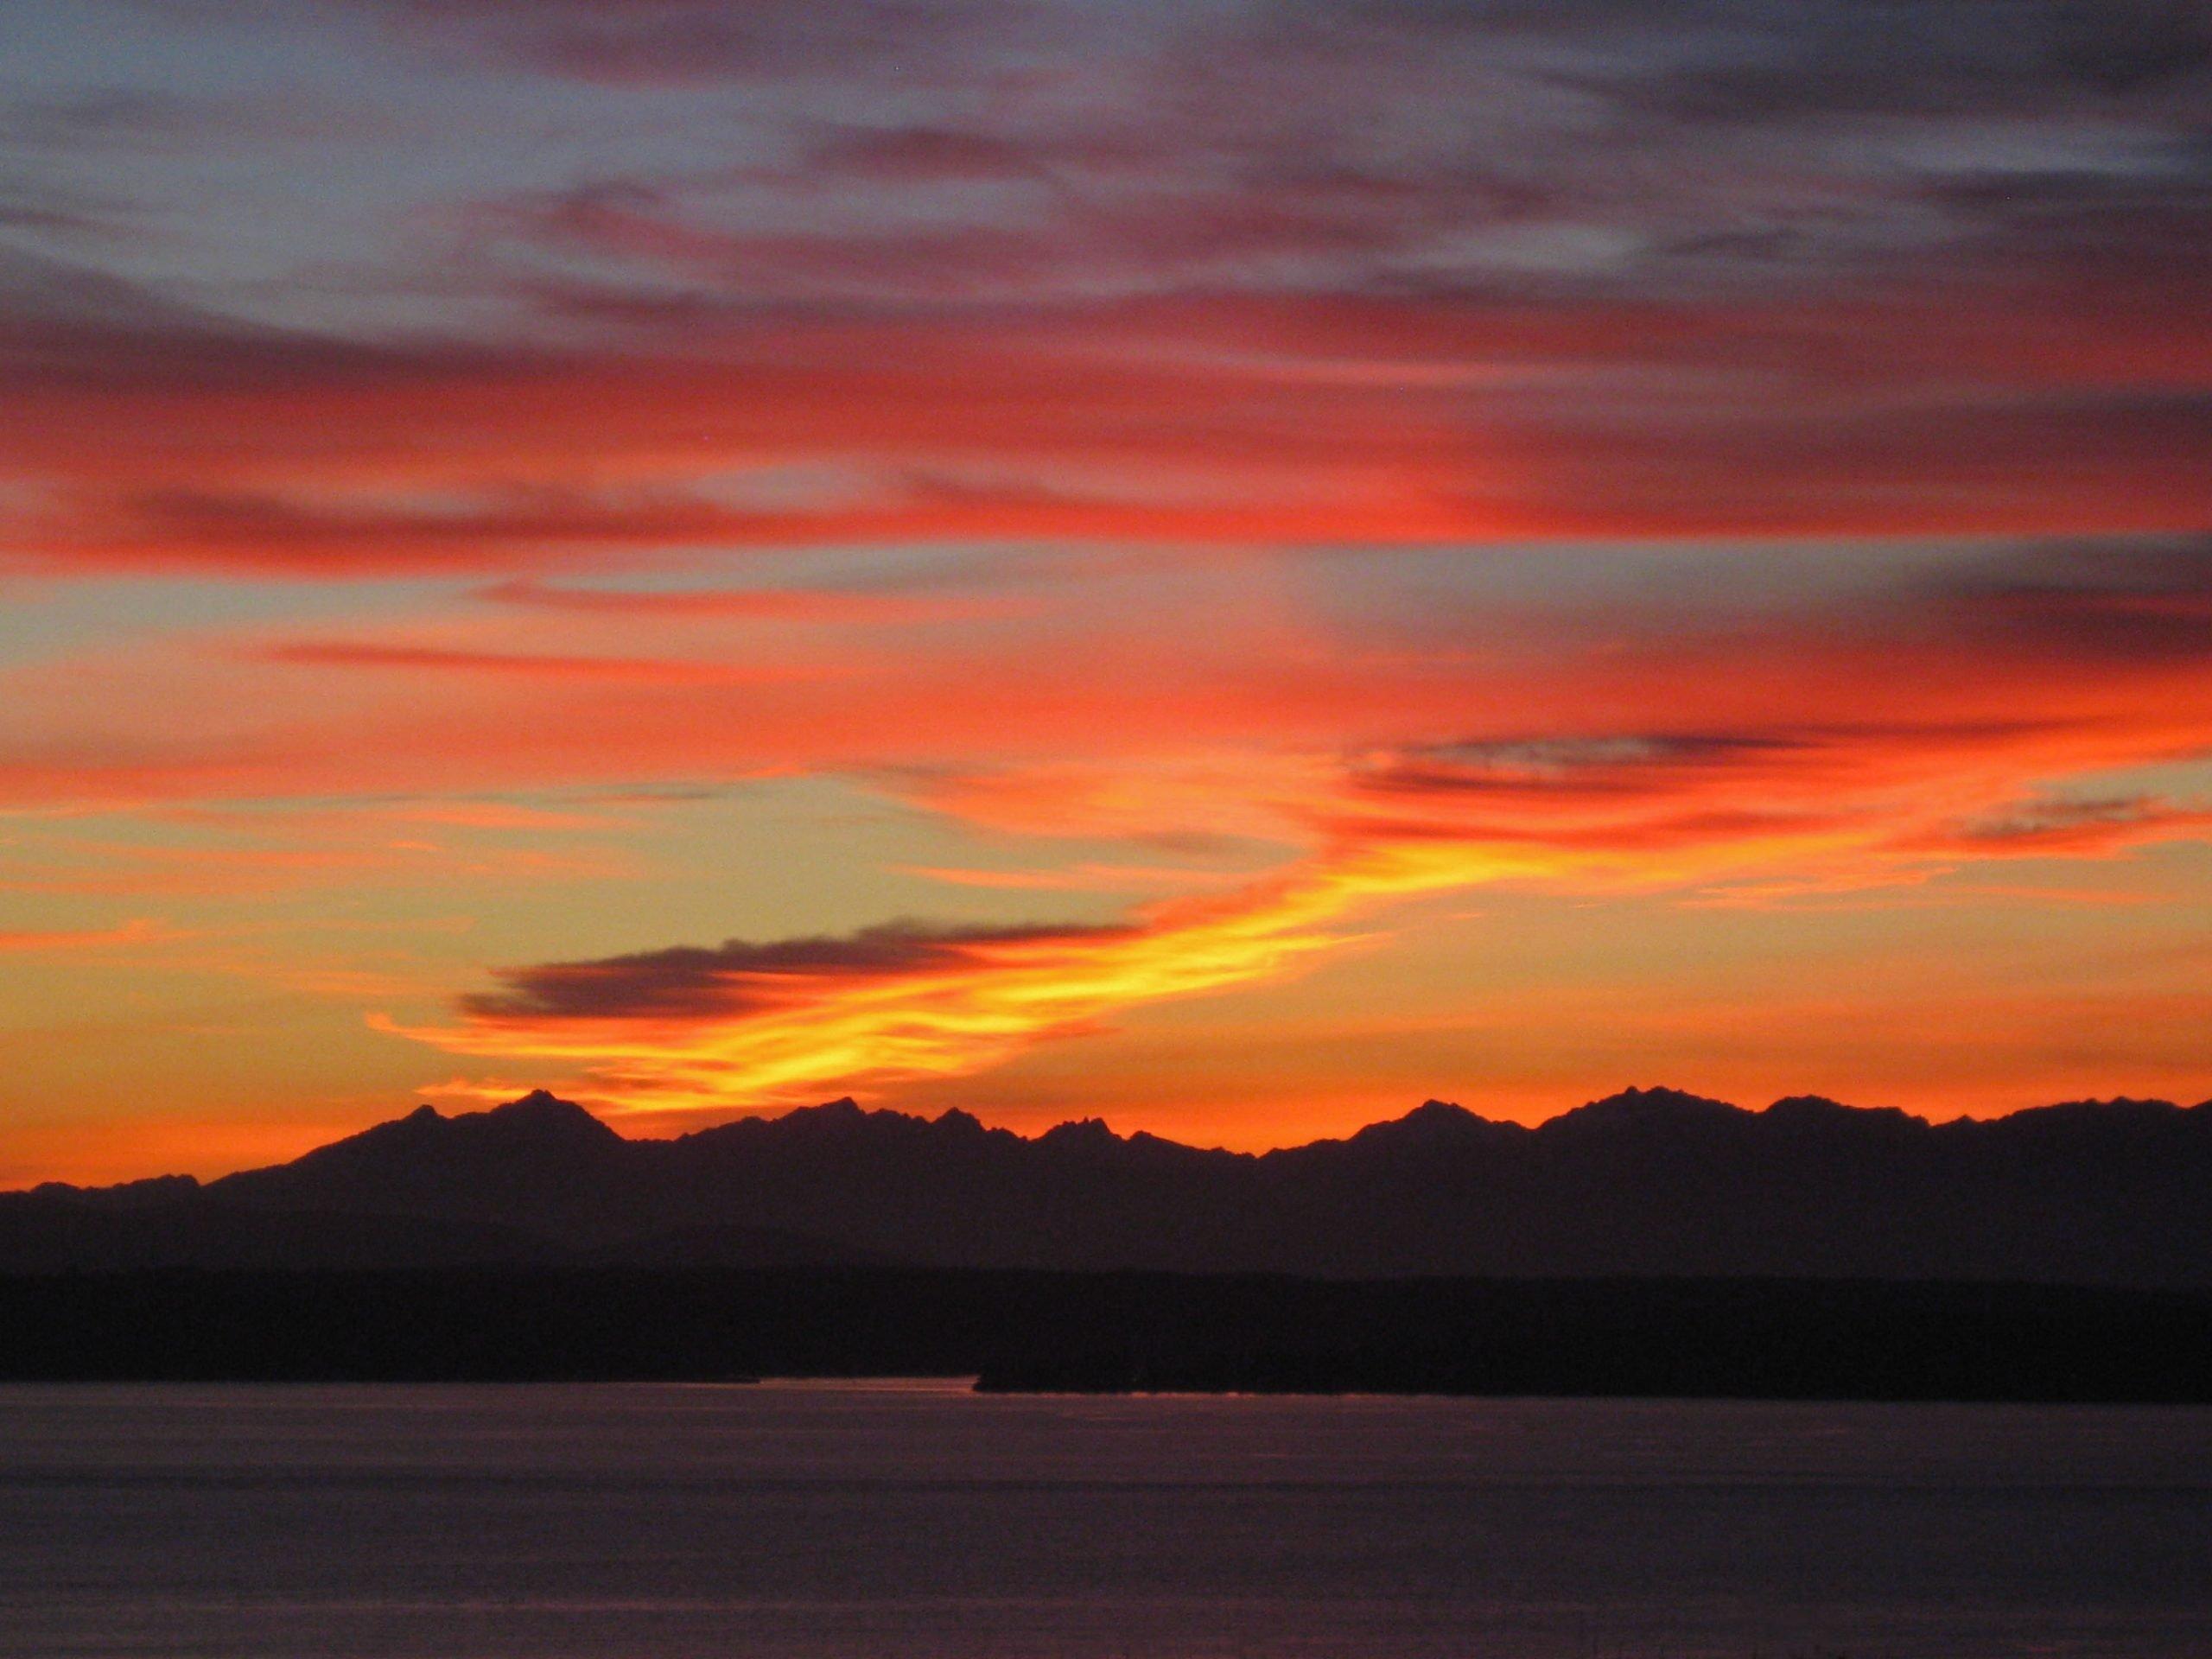 Seattle sunset, October 5, 2013 (Photo: Helen Holter)